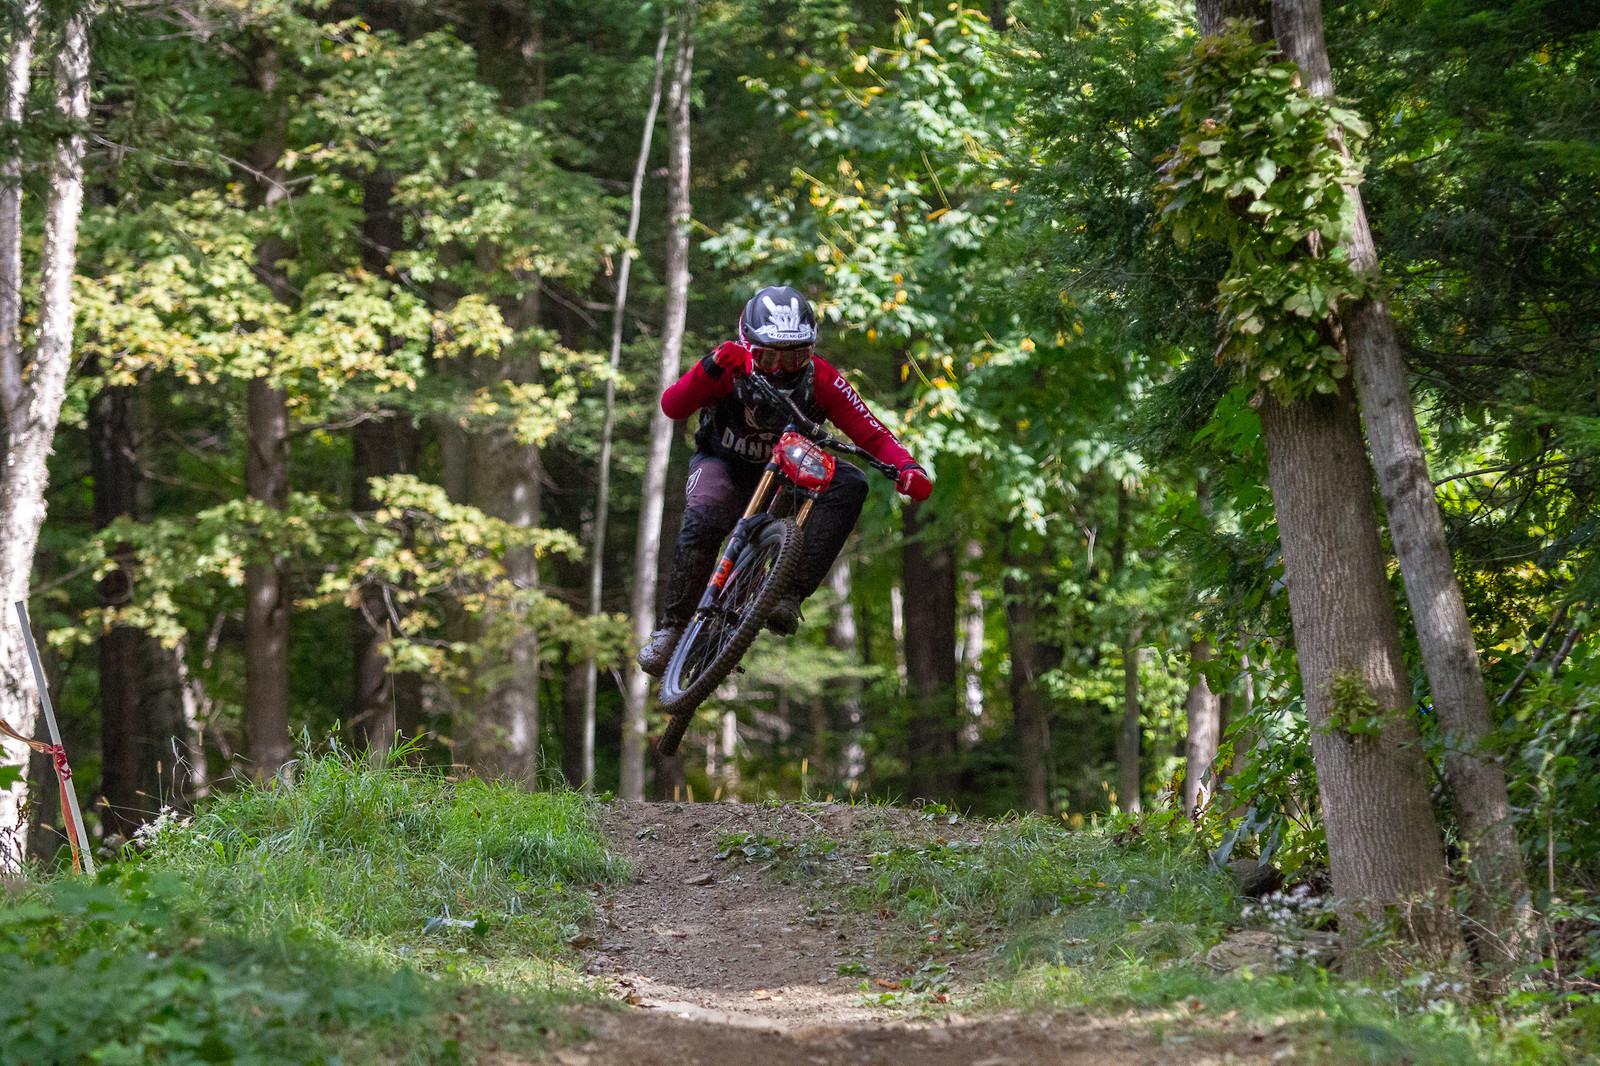 Mauricio Estrada - JackRice - Mountain Biking Pictures - Vital MTB